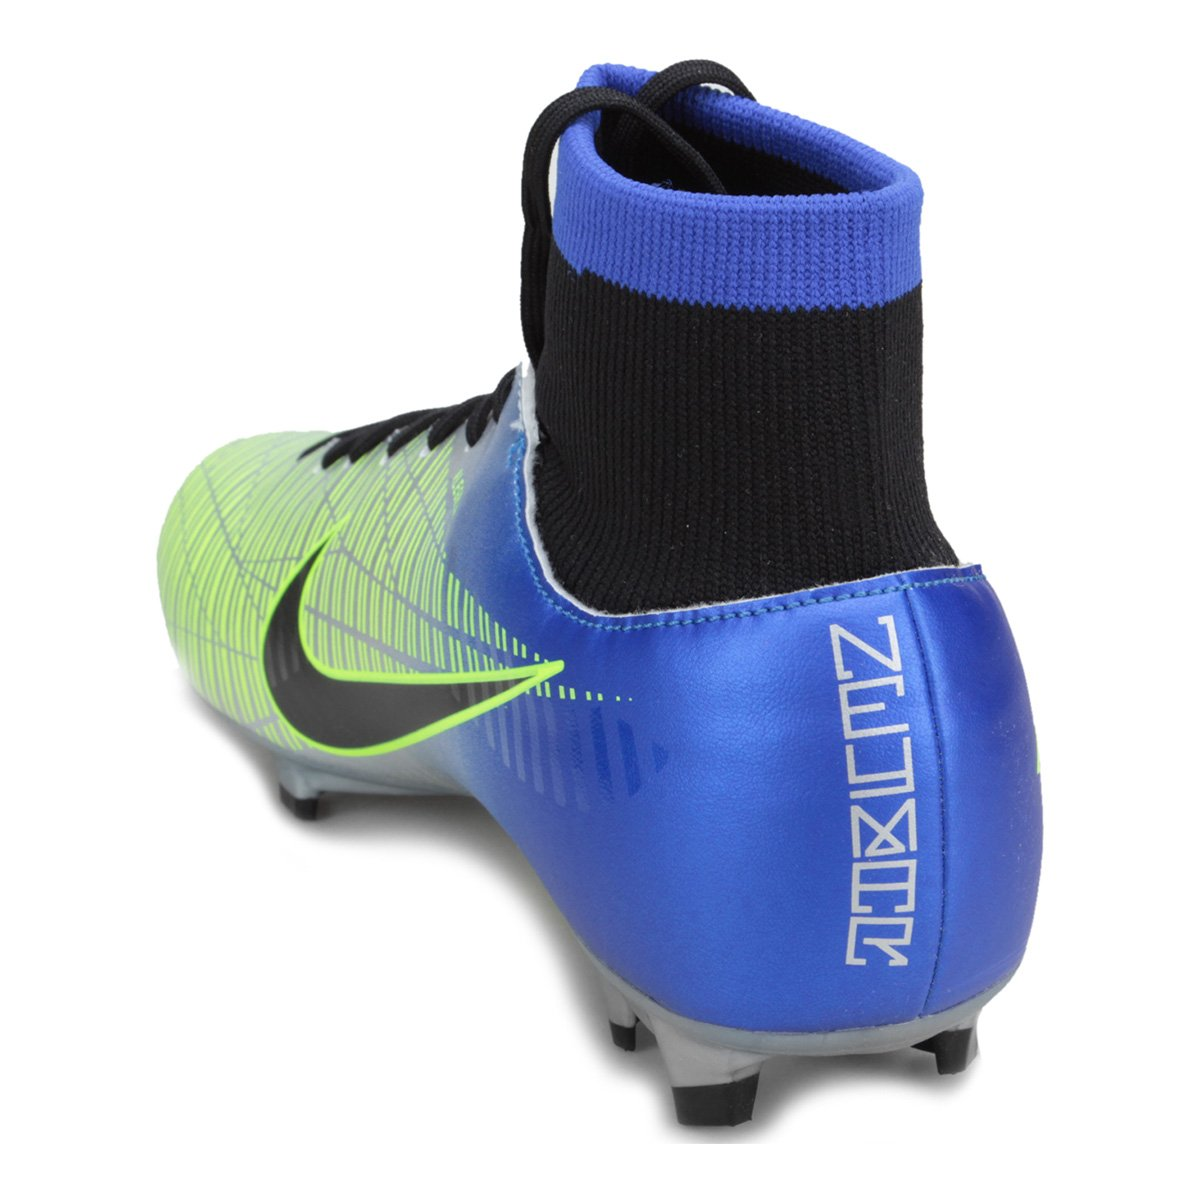 Nike Masculina Victory Campo FG Preto Neymar Mercurial e Azul DF Chuteira 6 Jr g4Tnzqw5wW